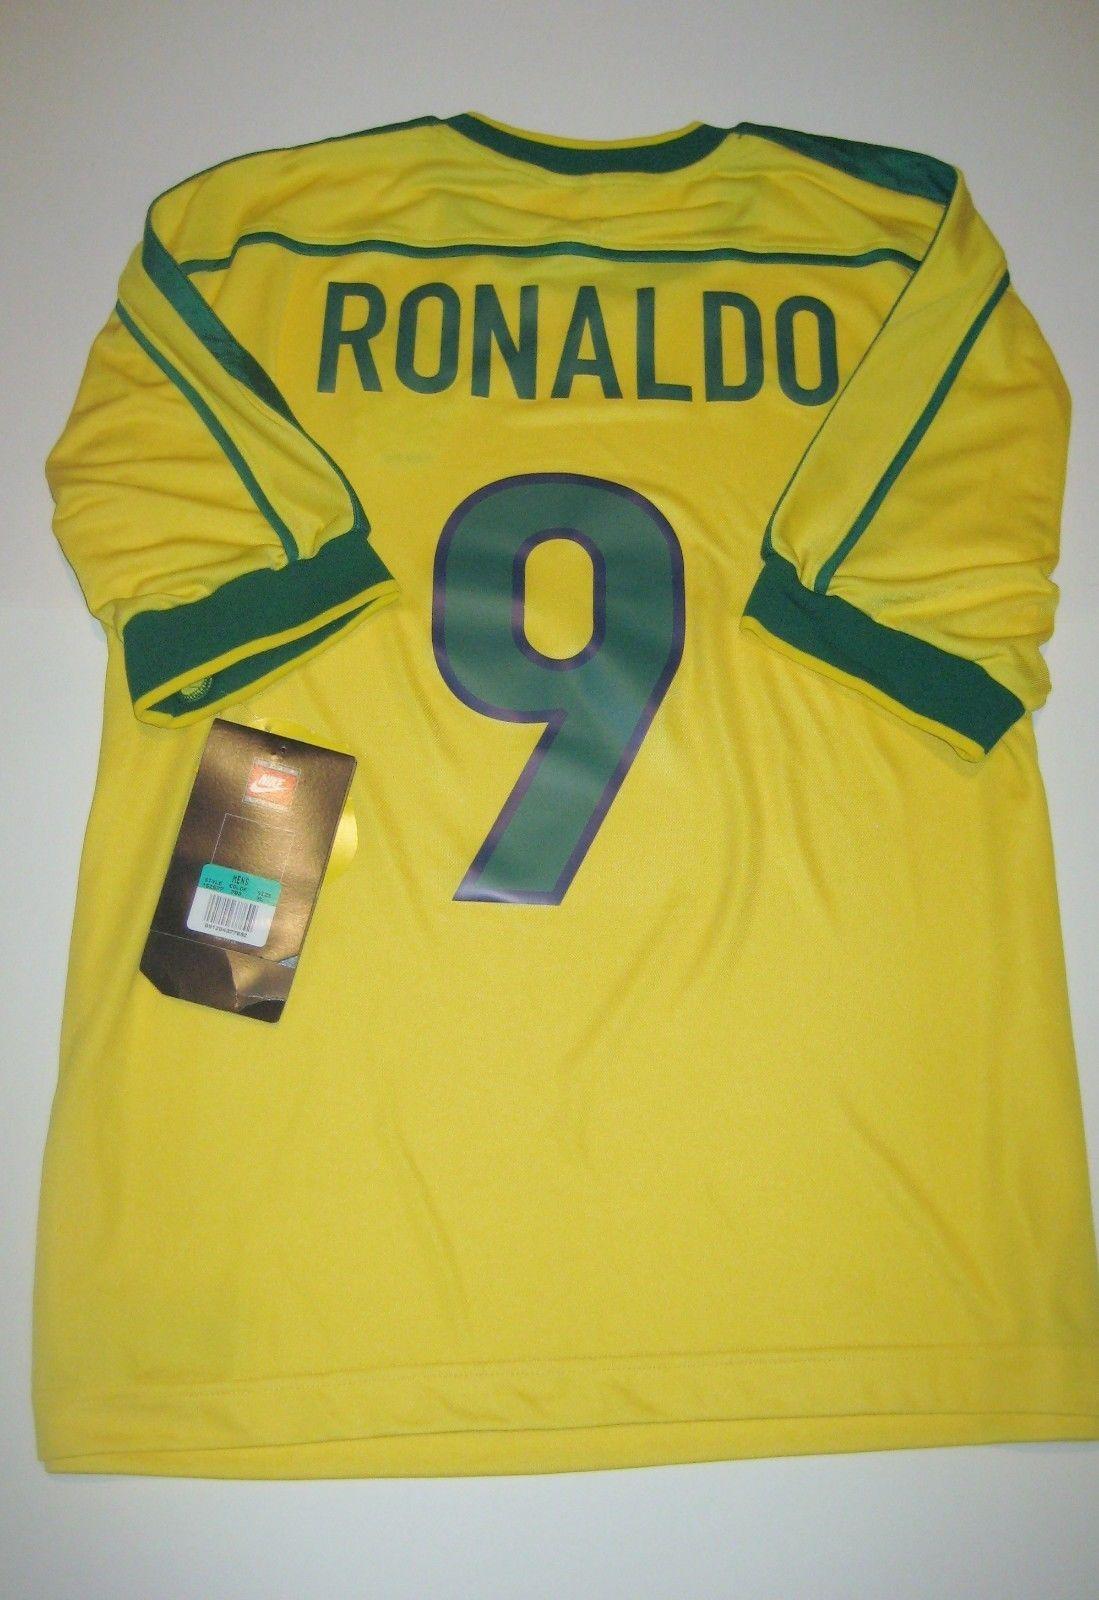 New 1998-2000 World Cup Nike Brazil Ronaldo  9 Kit Jersey Brasil Home Shirt  (eBay Link) 011dad6f5